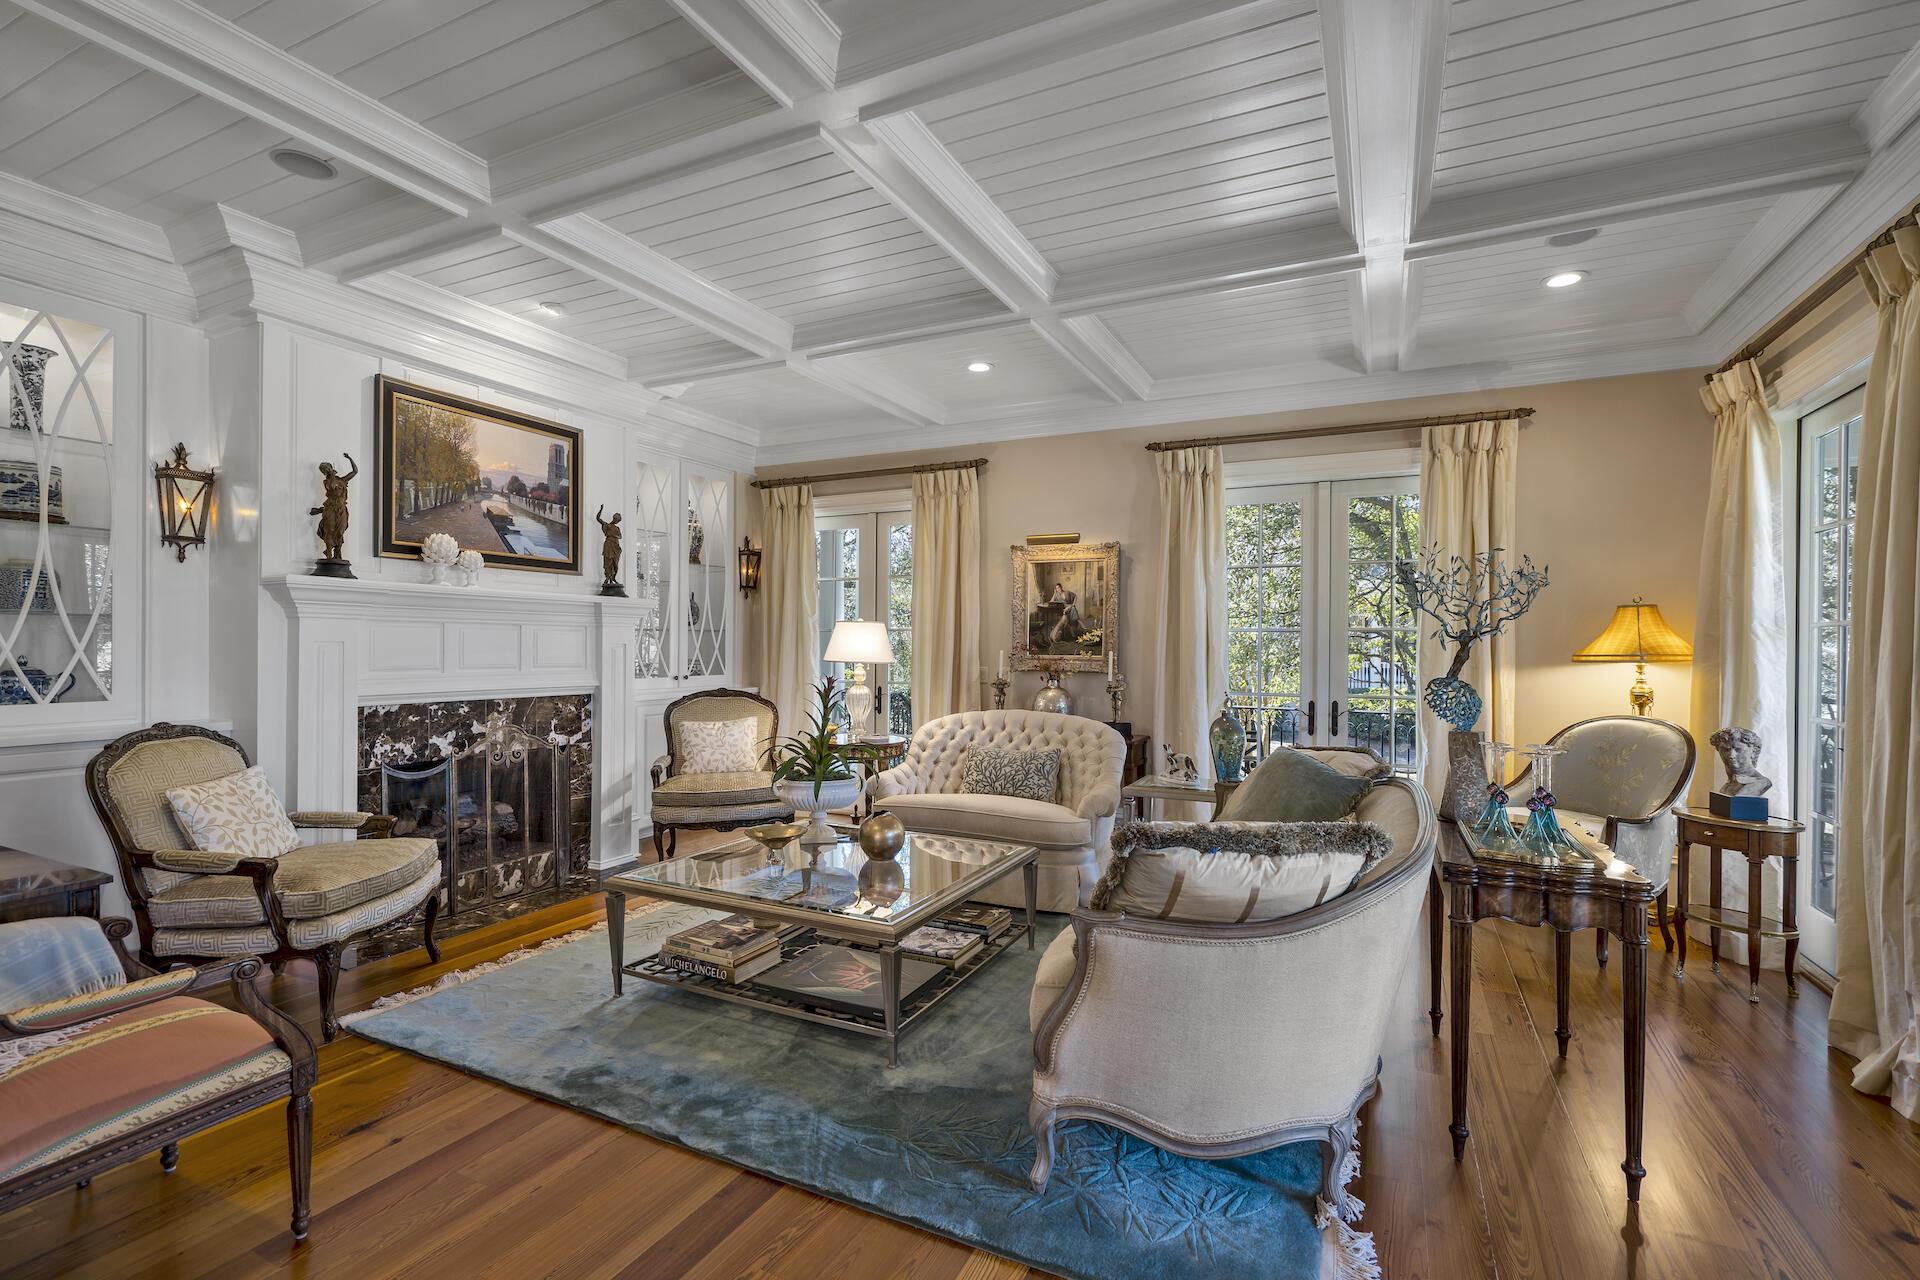 Daniel Island Homes For Sale - 623 Island Park, Charleston, SC - 31